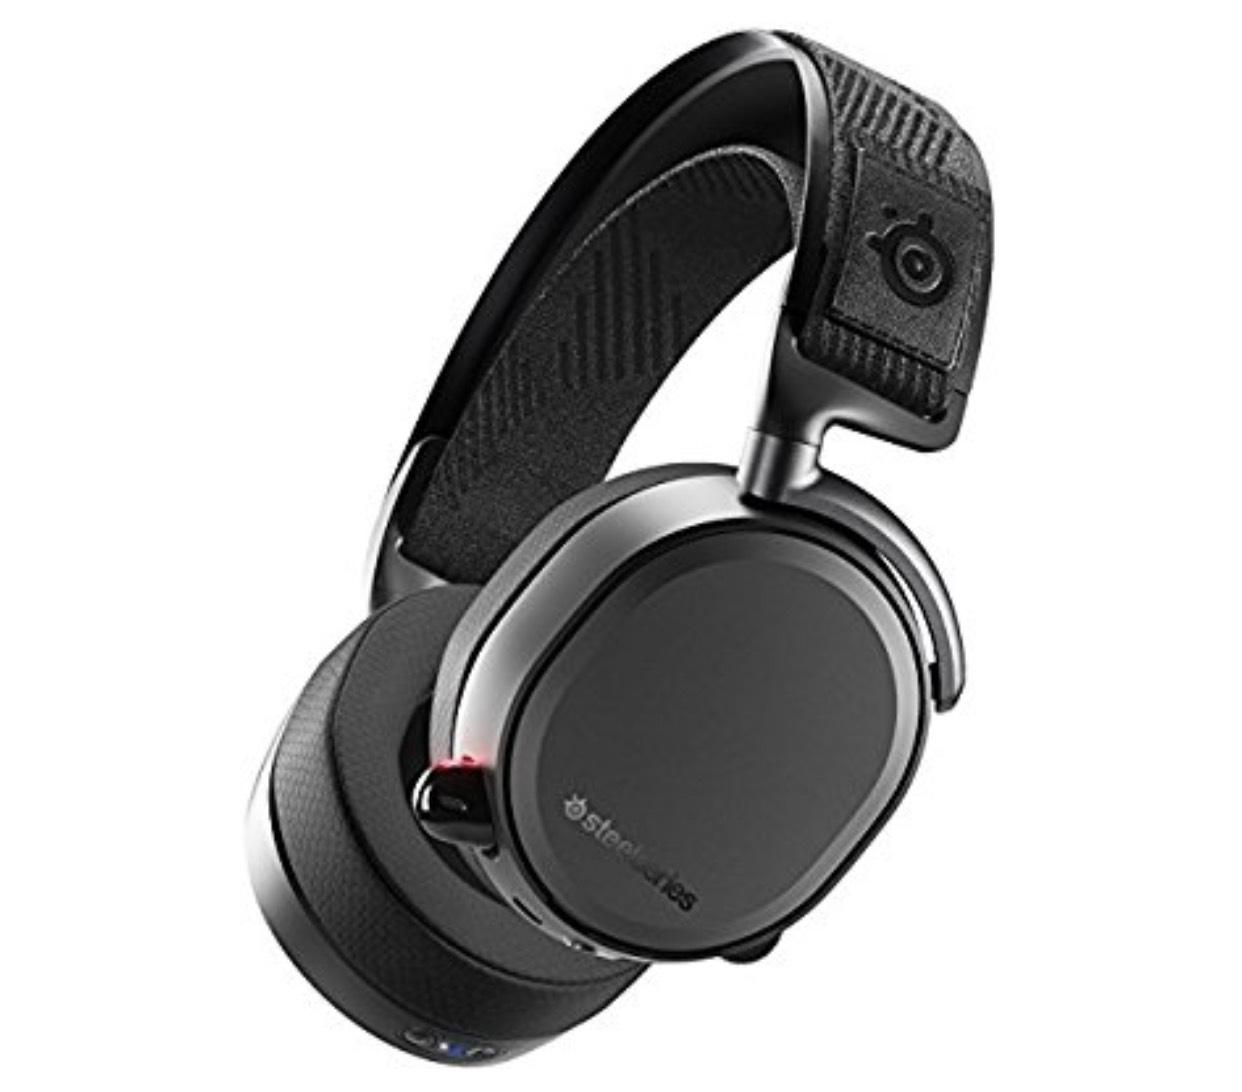 Micro casque sans fil SteelSeries Arctis Pro Wireless - 2,4 G & Bluetooth